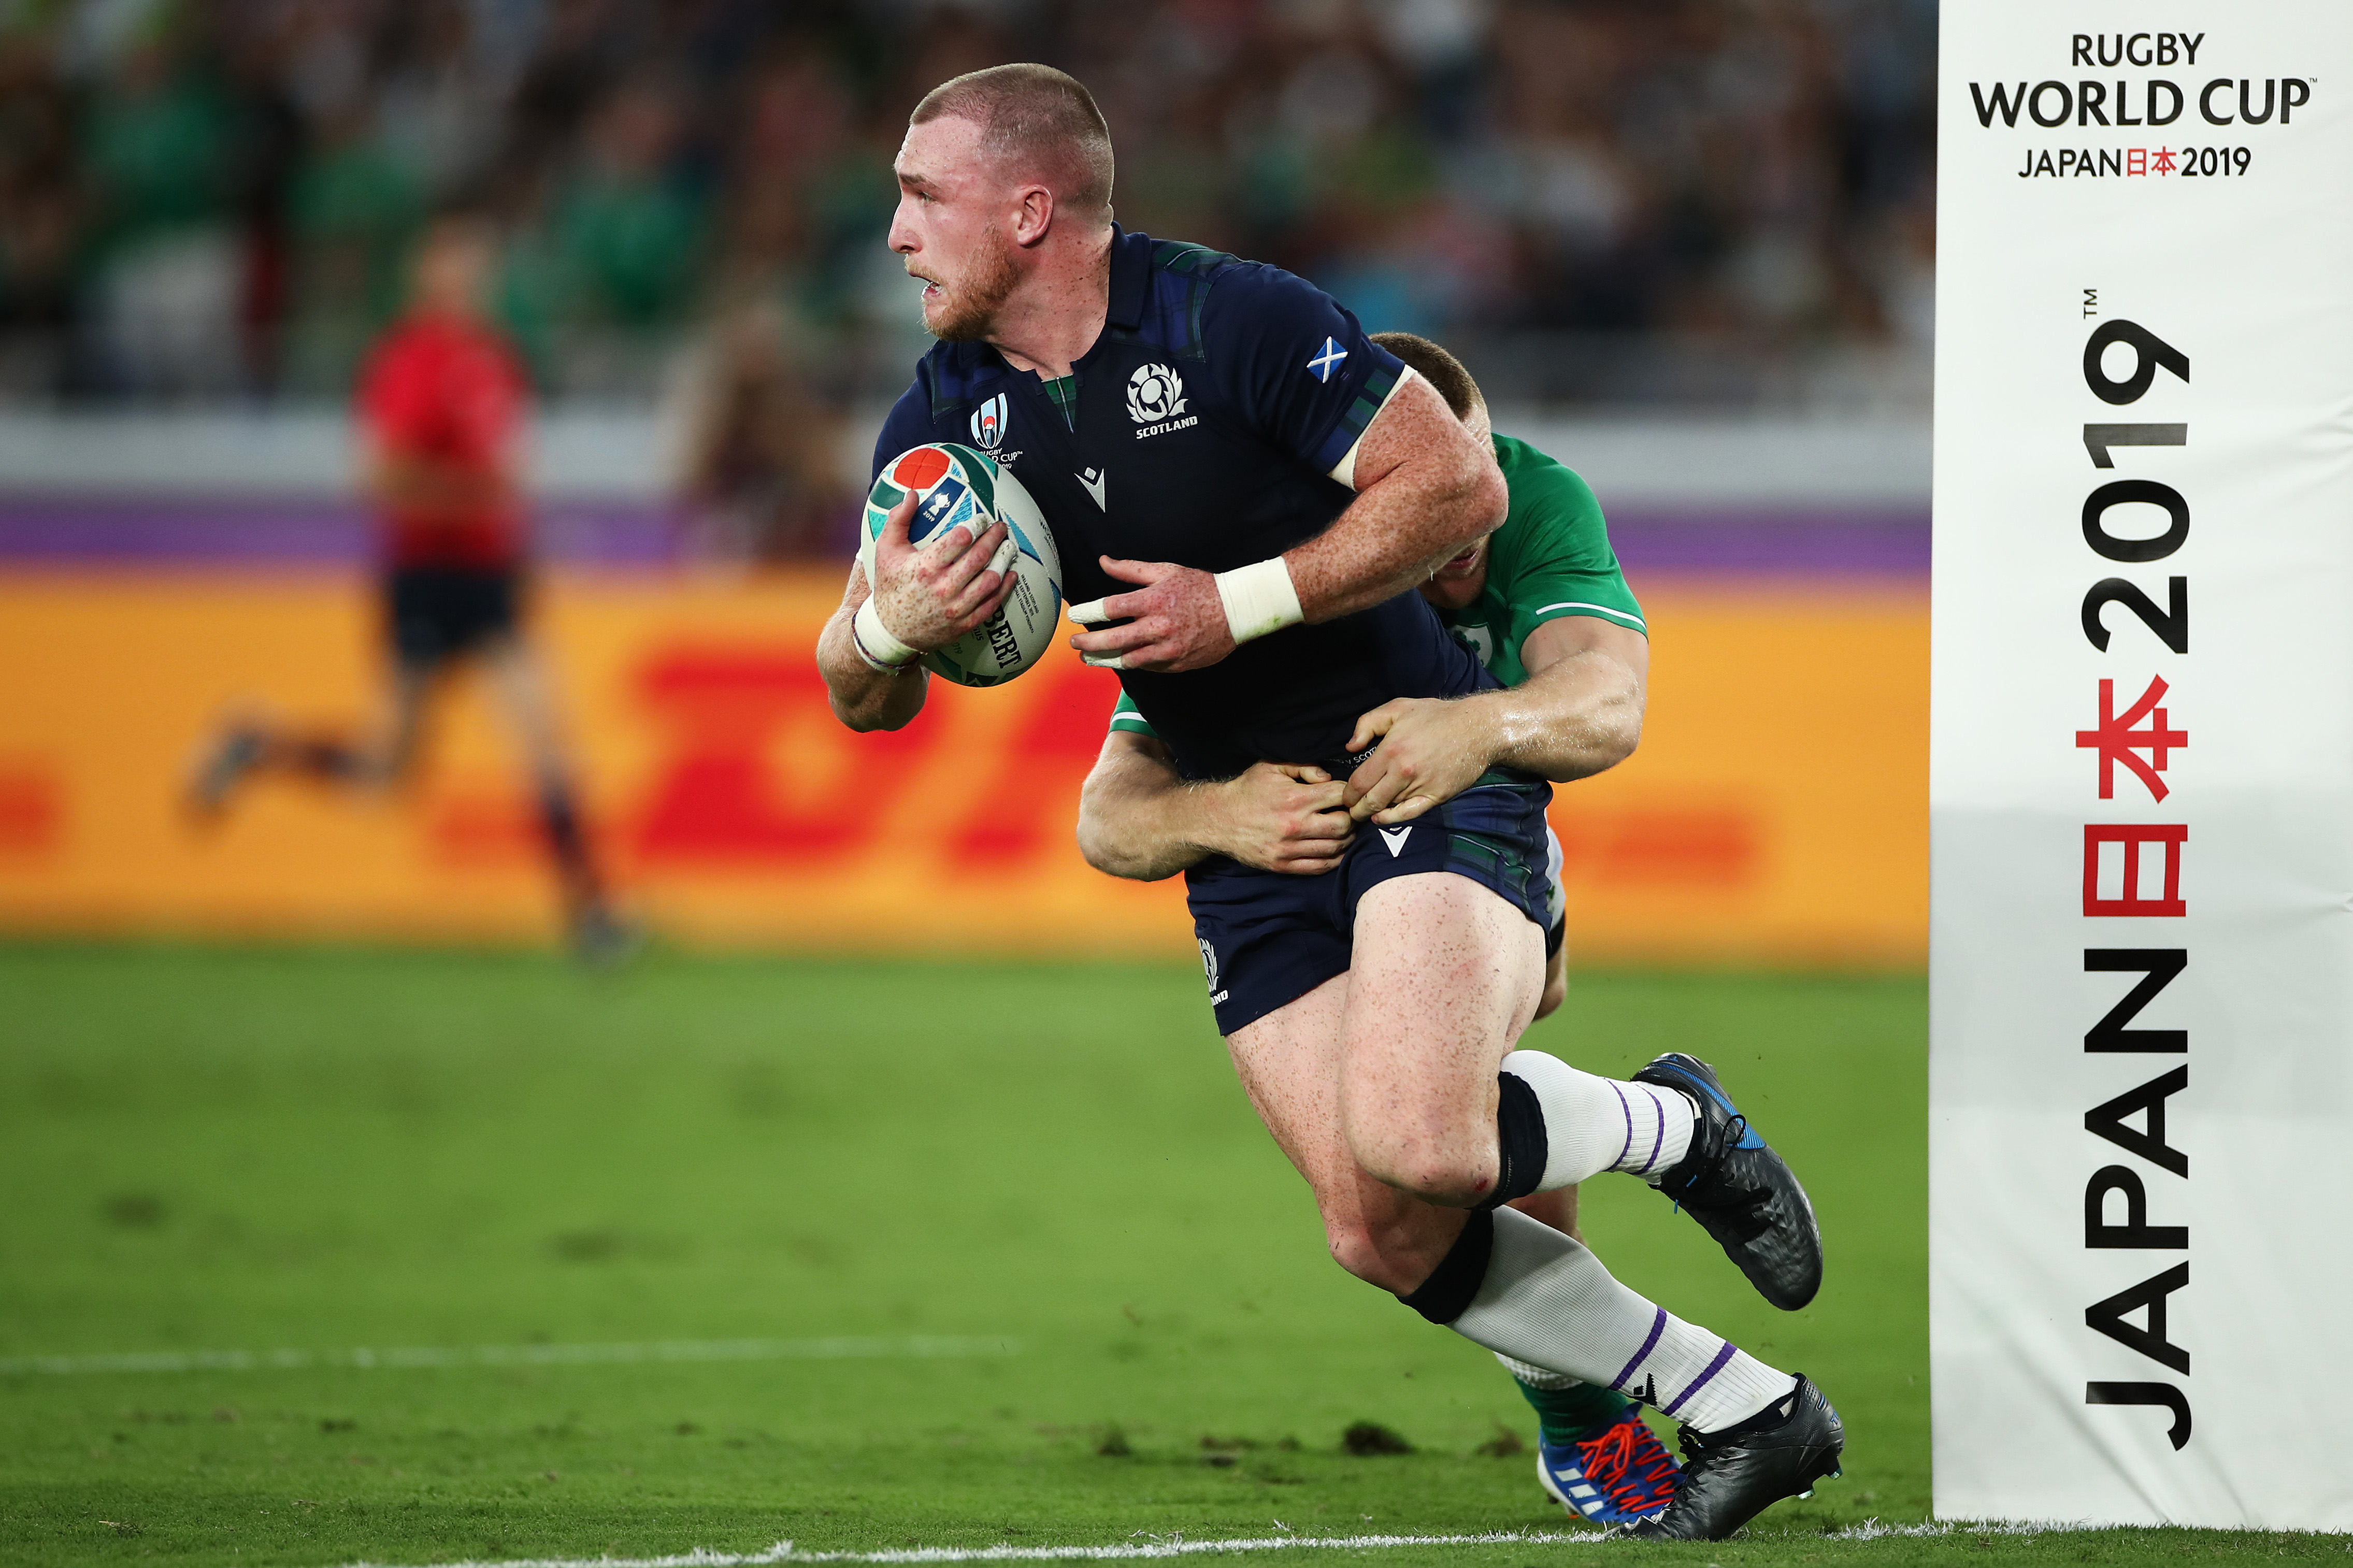 Stuart Hogg - has Scotland's best player been neutered by their kicking style.